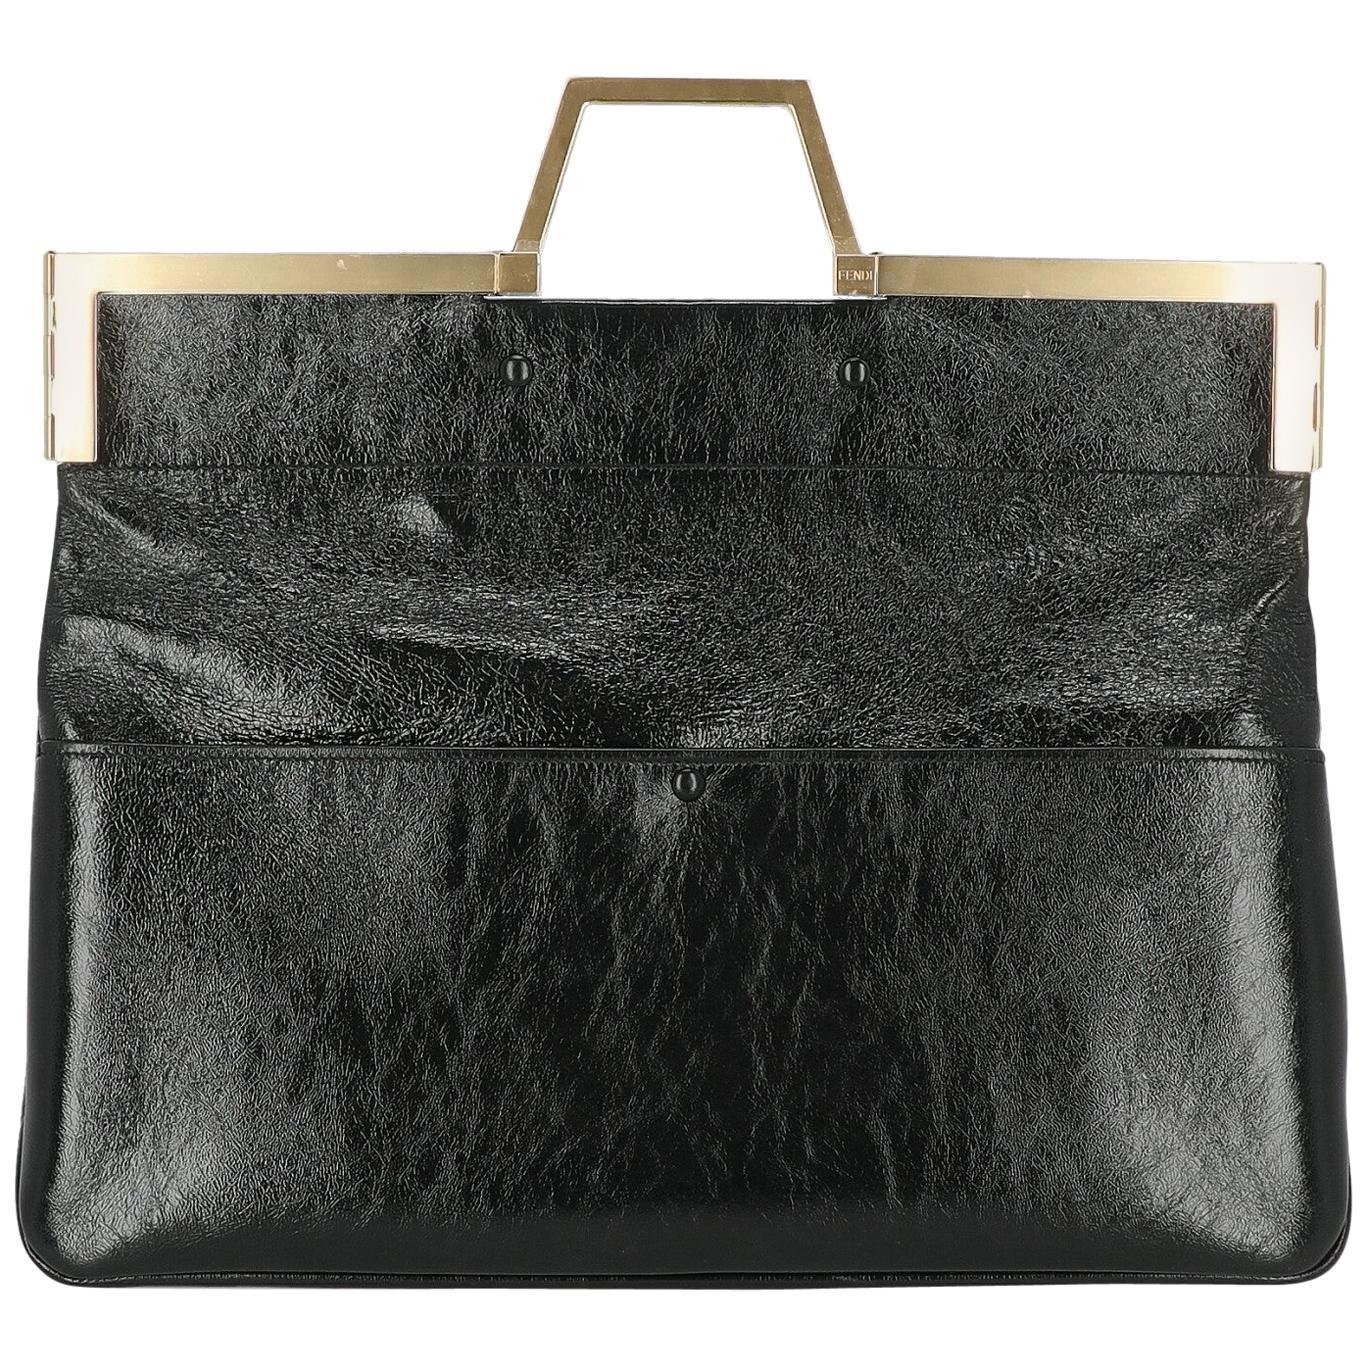 Fendi Women's Handbag Black Leather